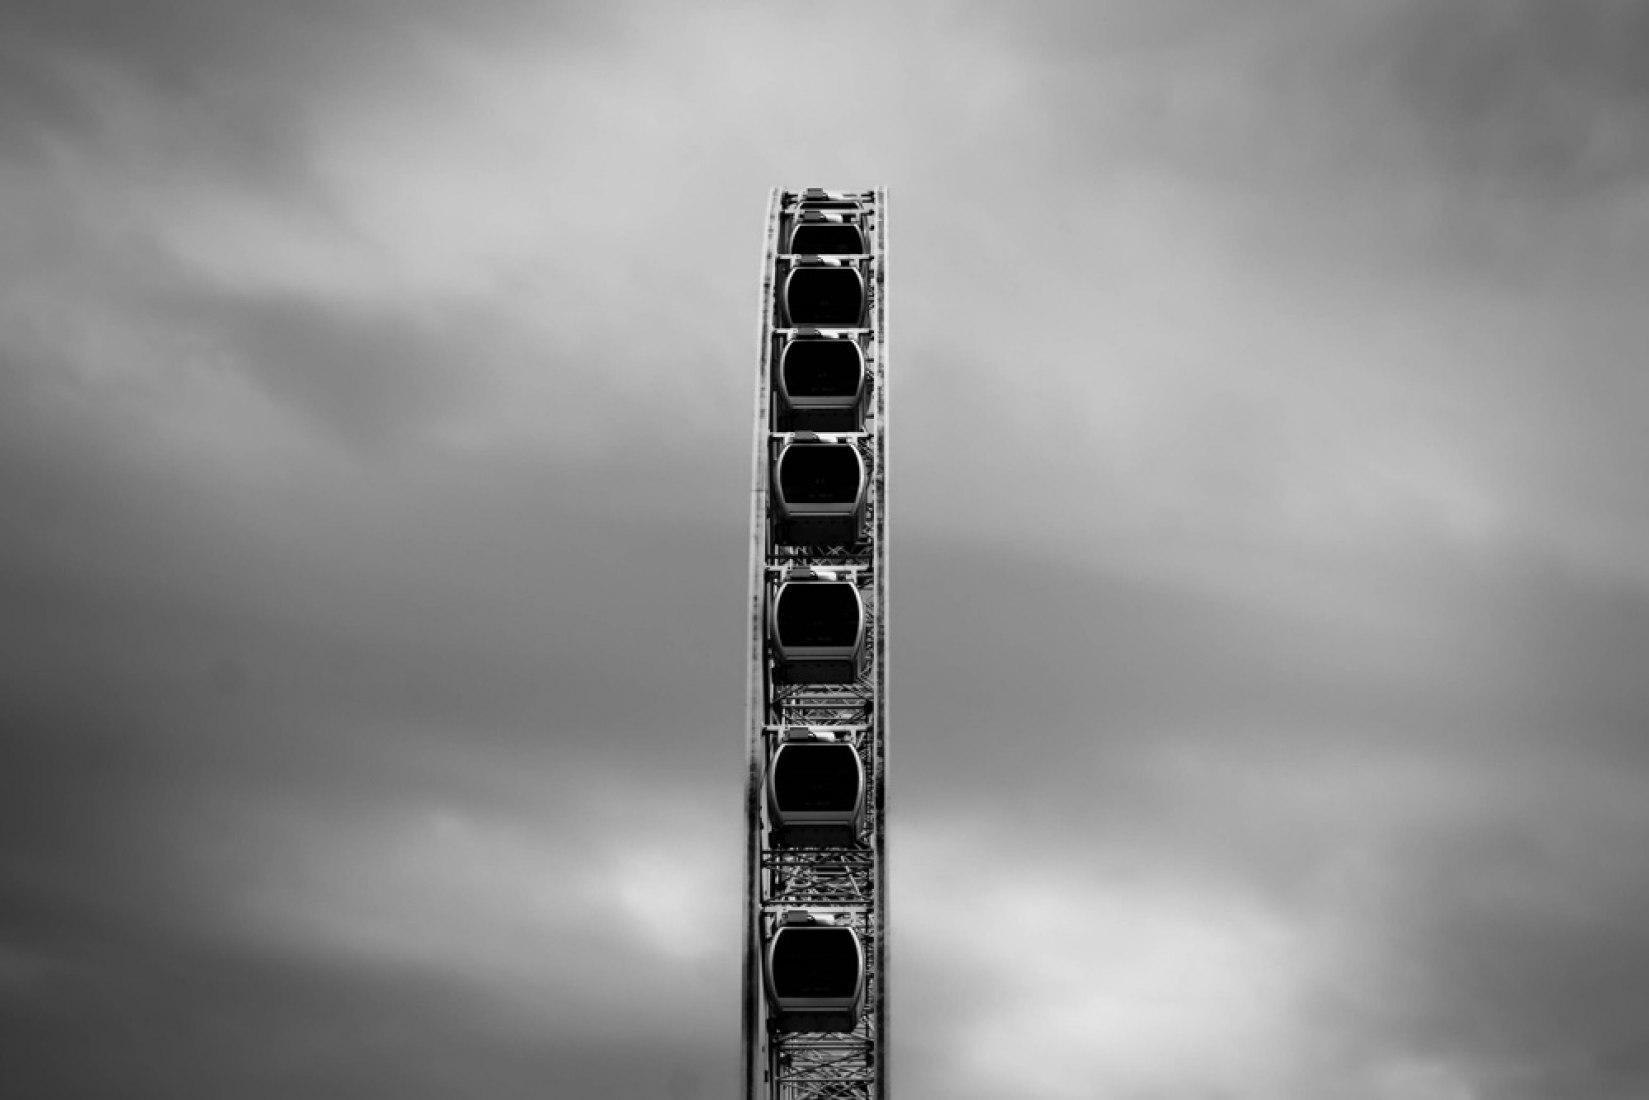 Ferris Wheel, Adult Only! Brisbane, QLD, Australia. © Ronald Frère.